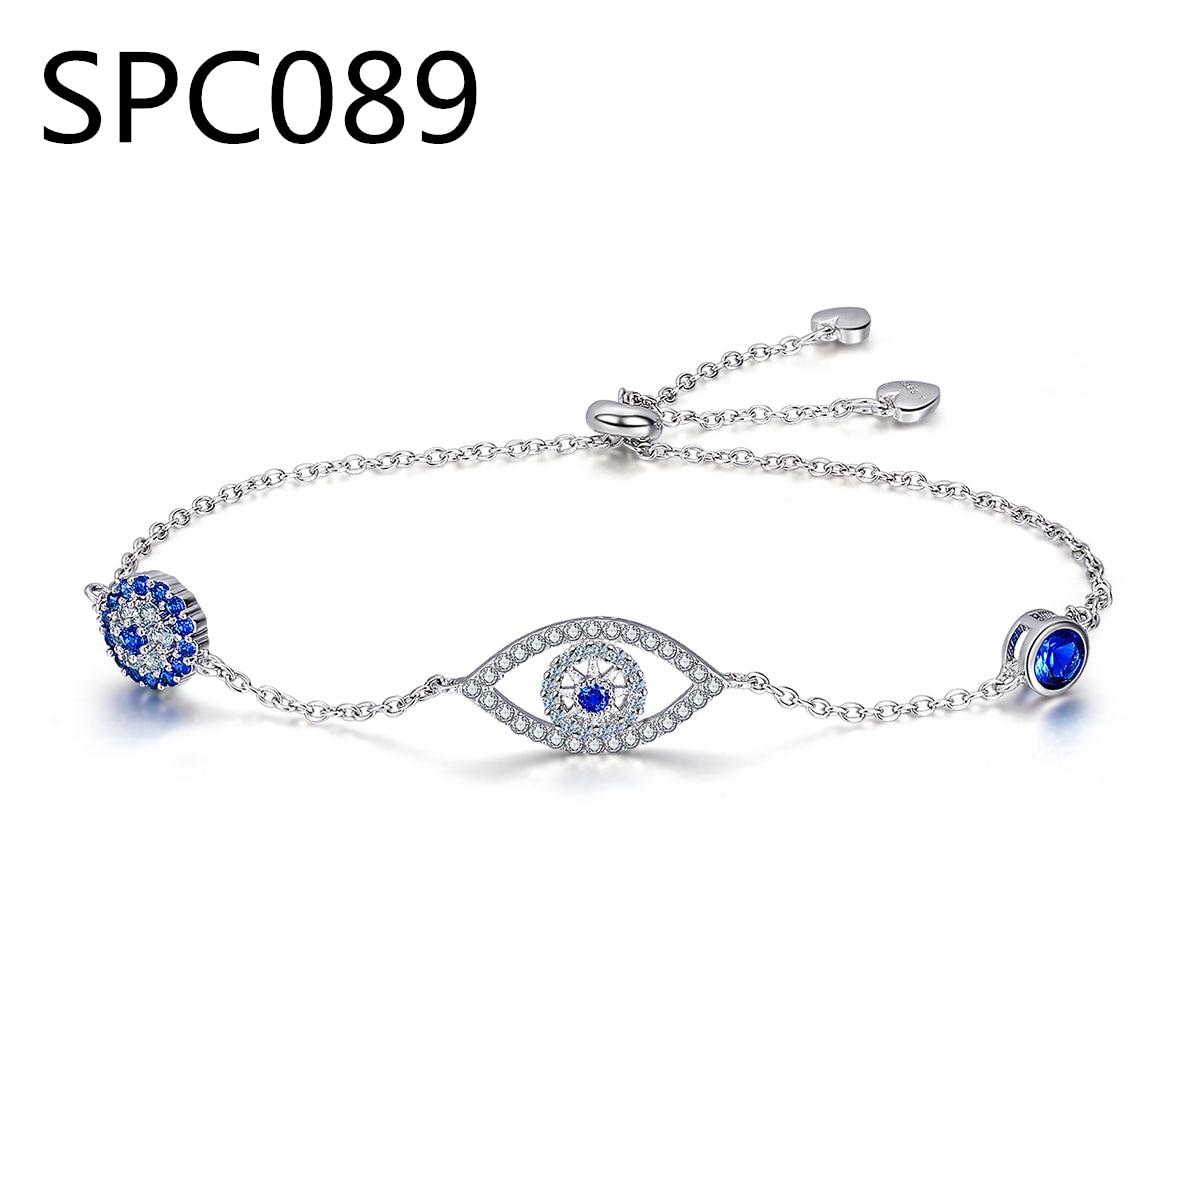 (Without Box) SPC5 Alloy Charm Women Bracelet with Murano Glass Beads Fashion DIY European Style Jewelry